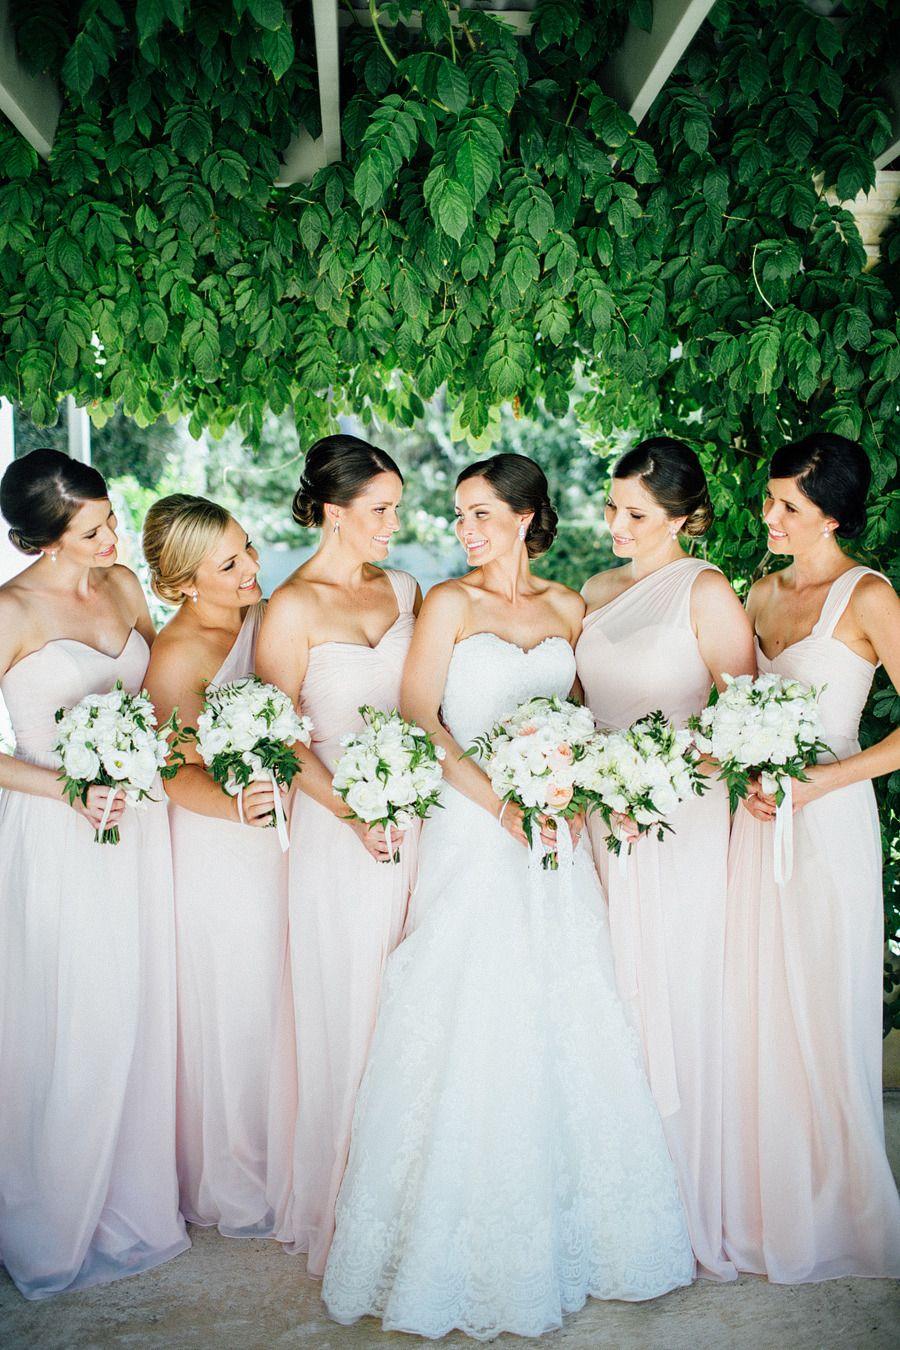 La Mariee Sweetheart Chiffon Bridesmaid Dresses Wedding Party Dress With Ruffles